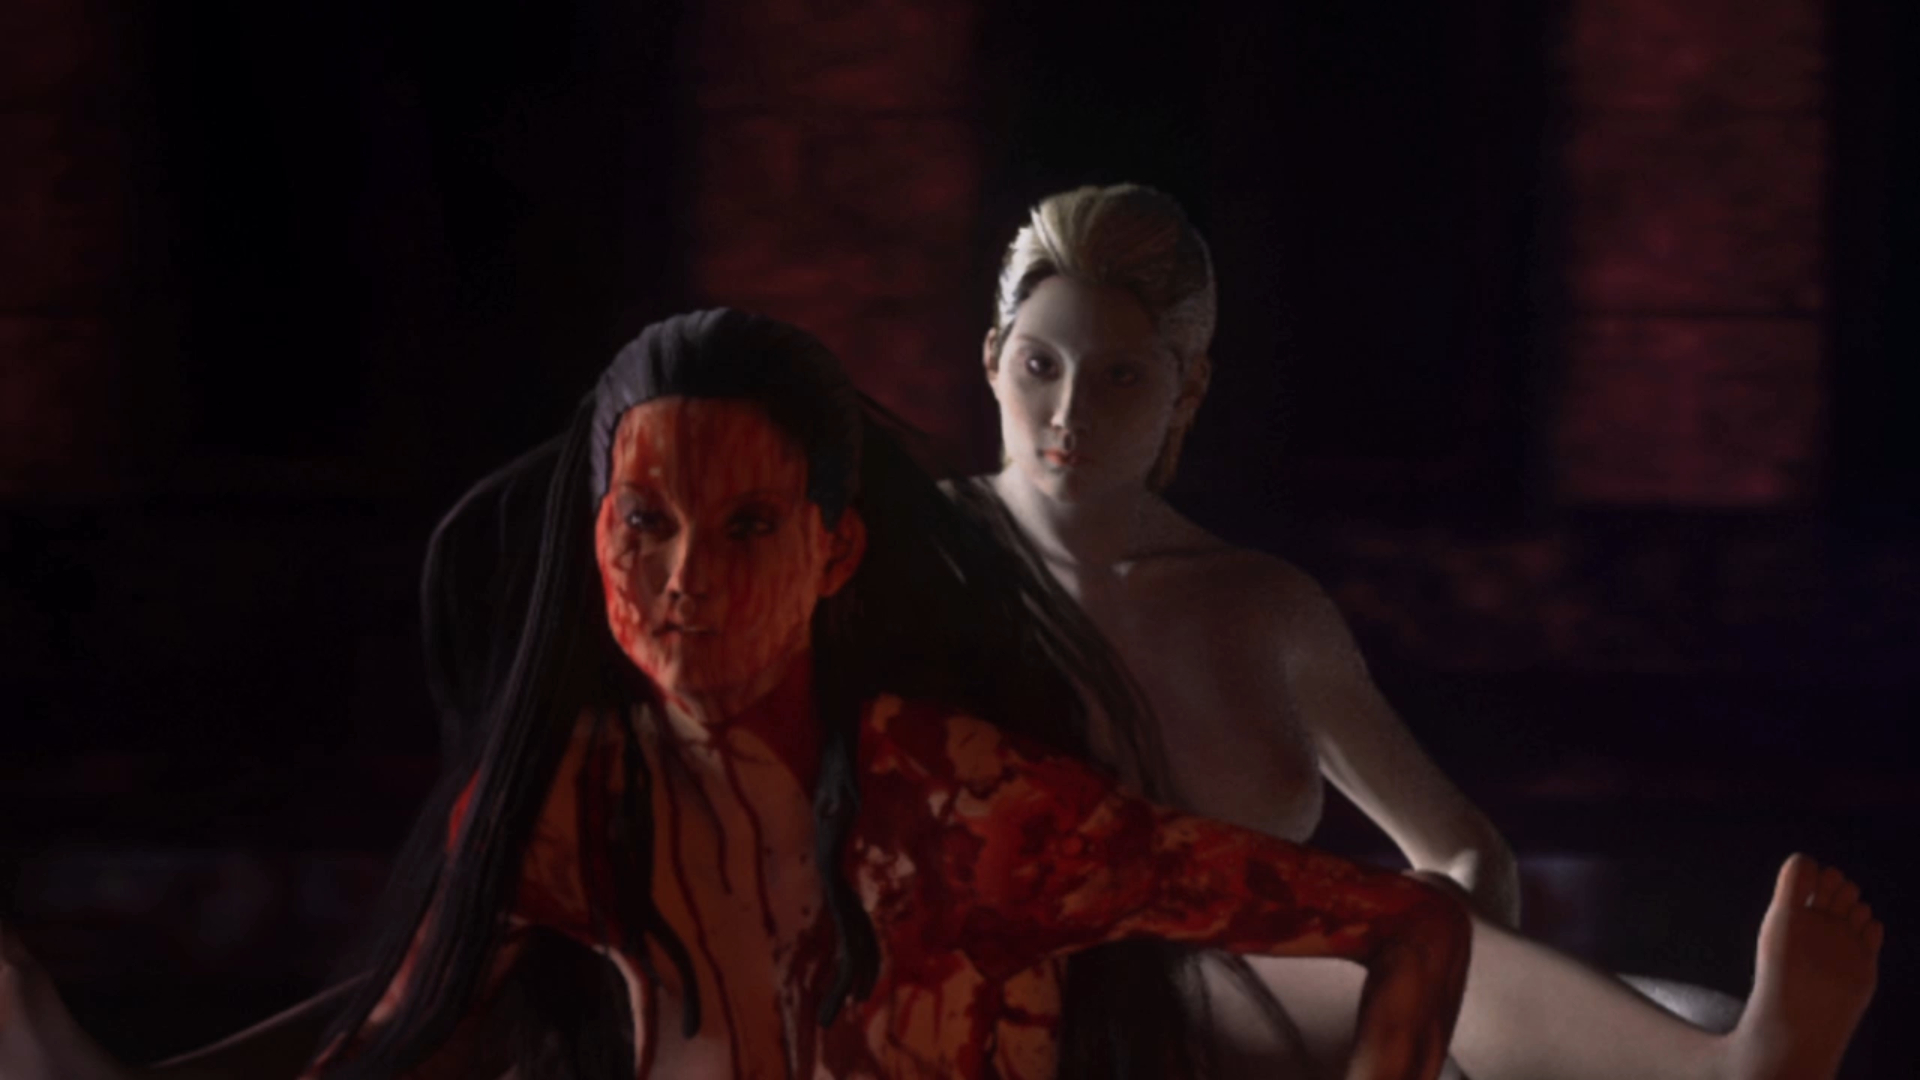 Buffy and angel hook up